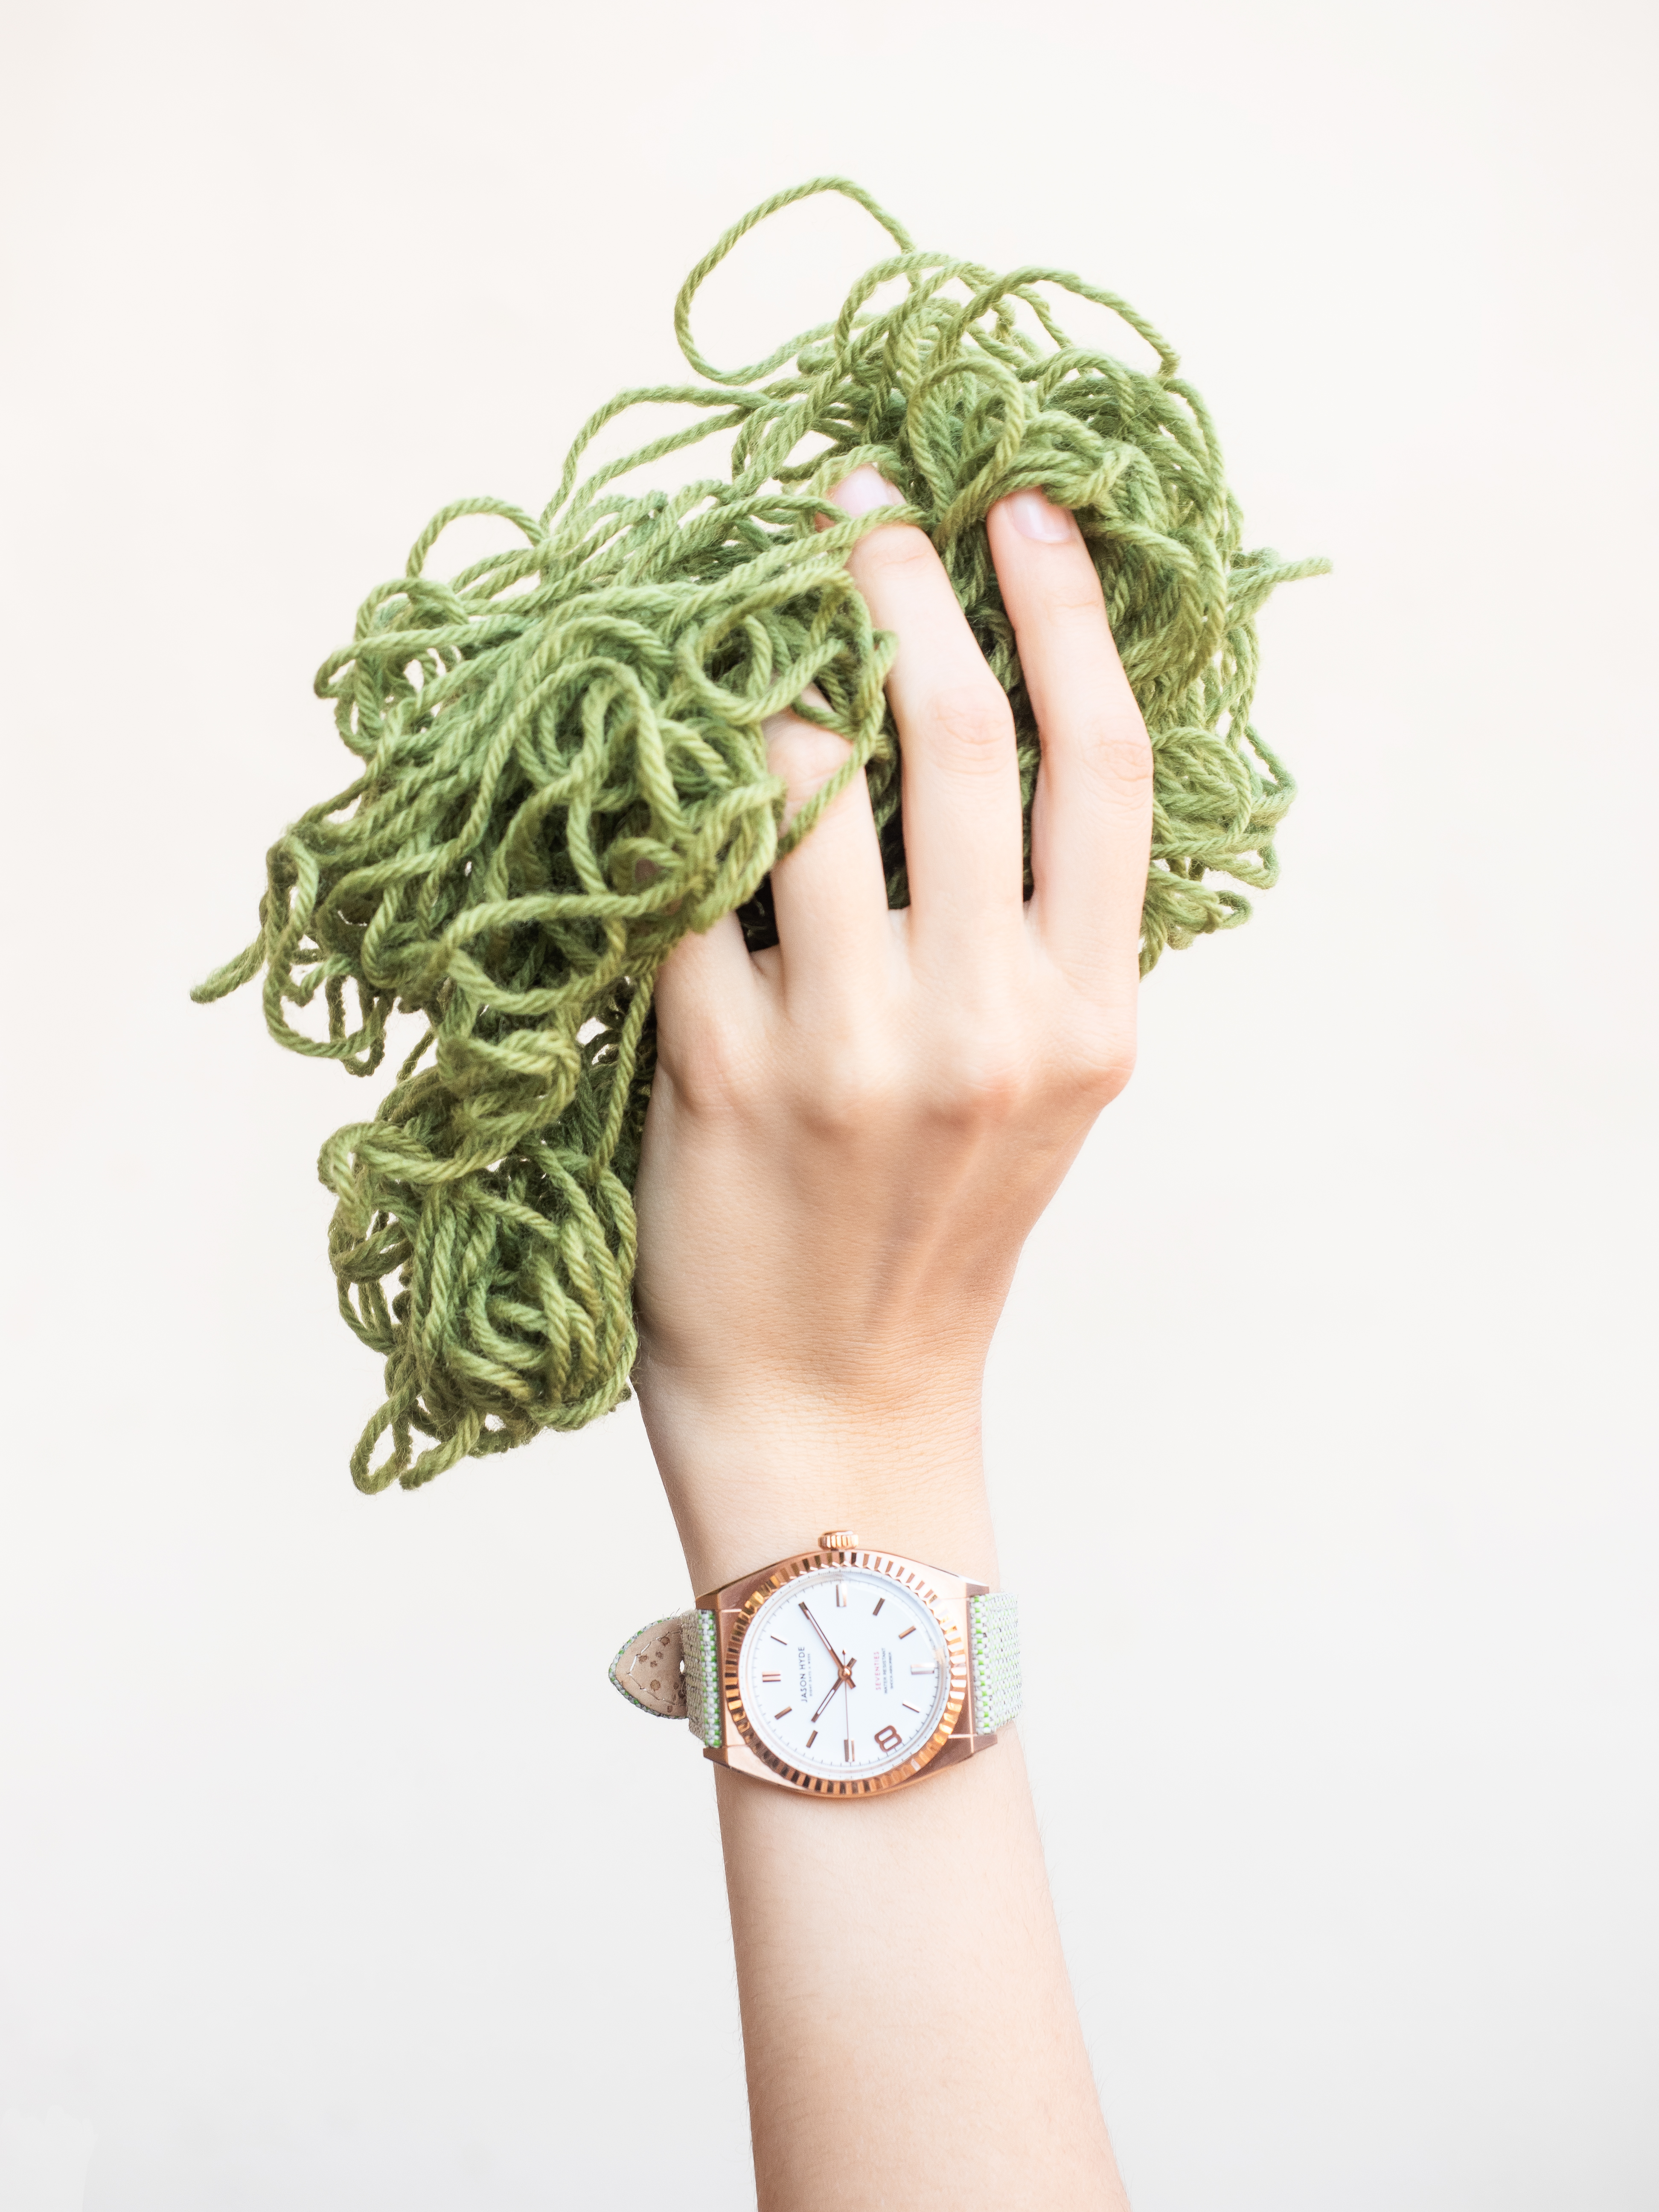 Jason Hyde – Eco Watch